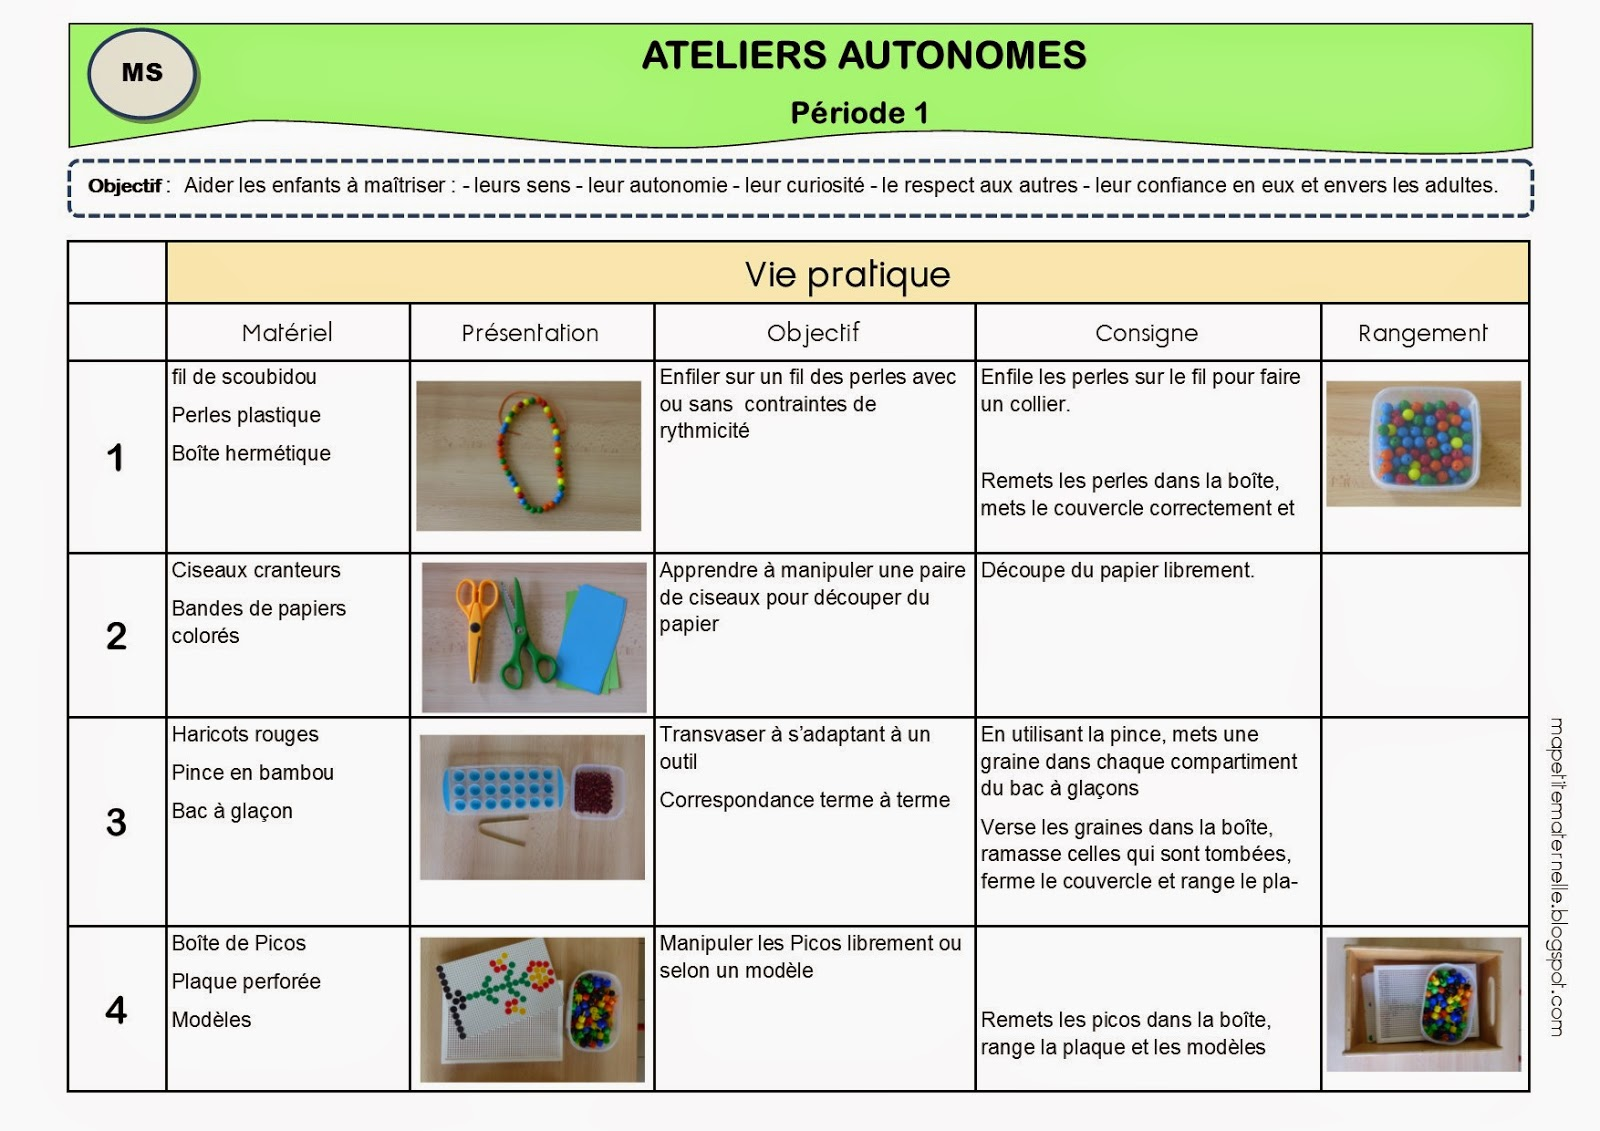 Souvent Ateliers autonomes type Montessori- Période 1 FX71